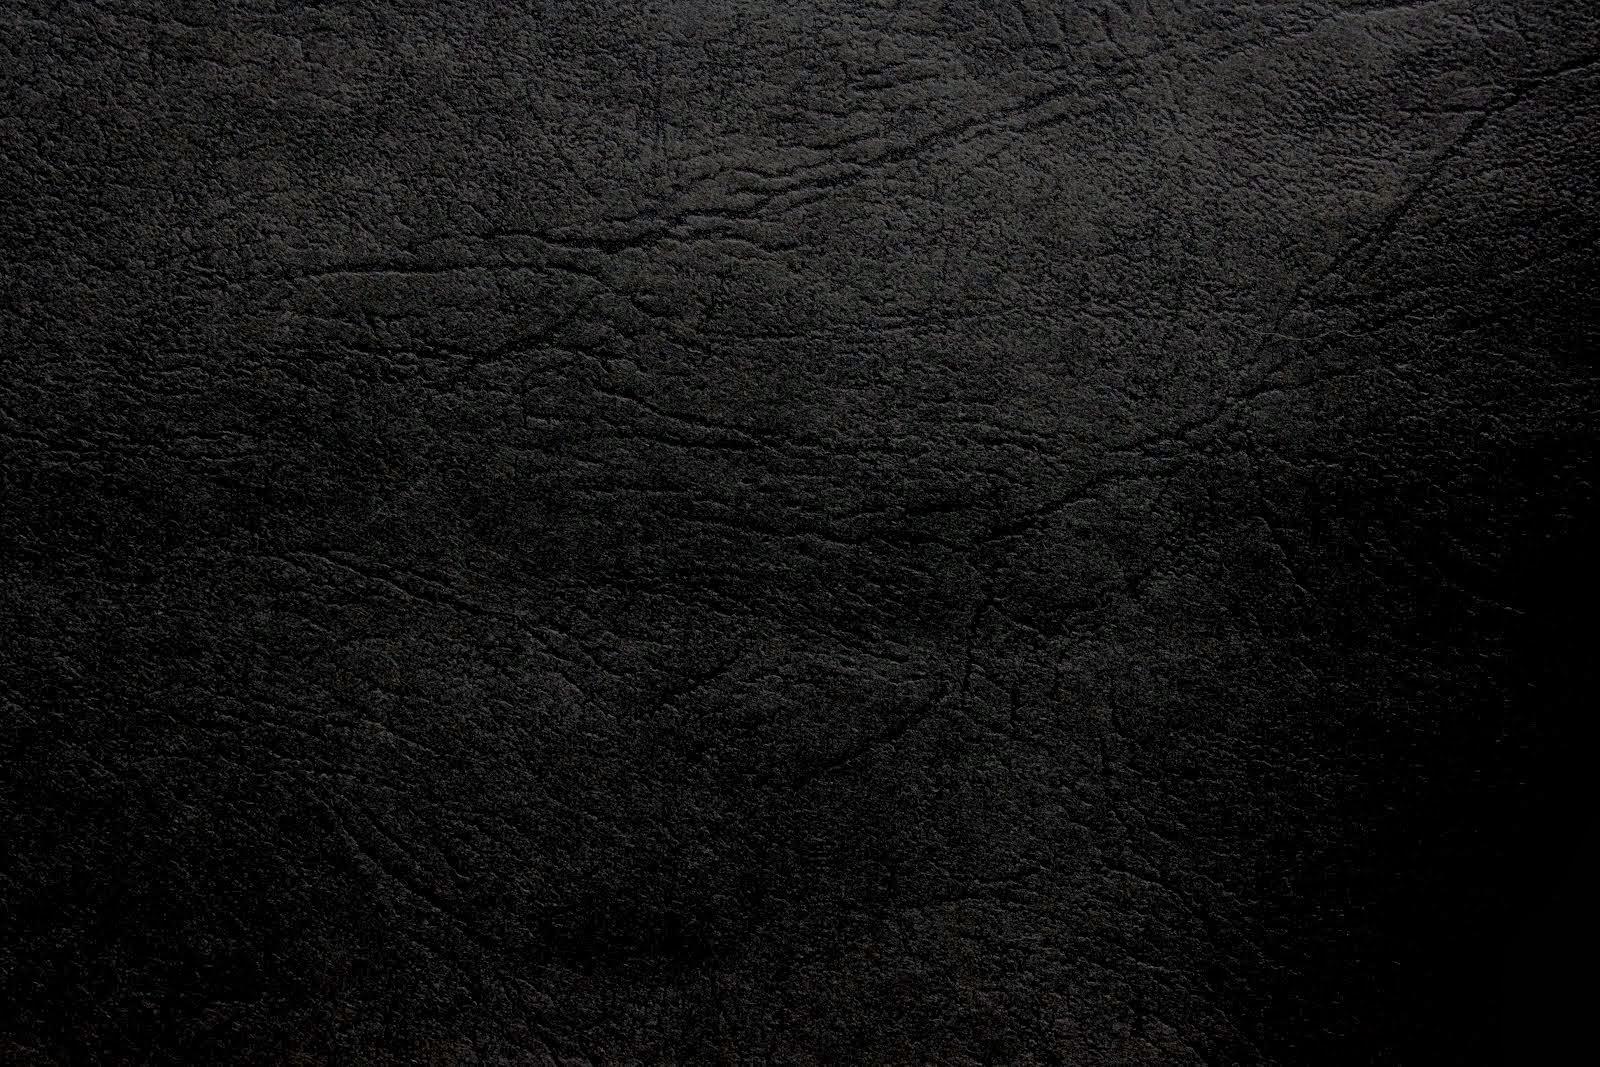 Monster High Ebay >> high tech gadget images: Free Pvc Textures Ajilbab Com Portal